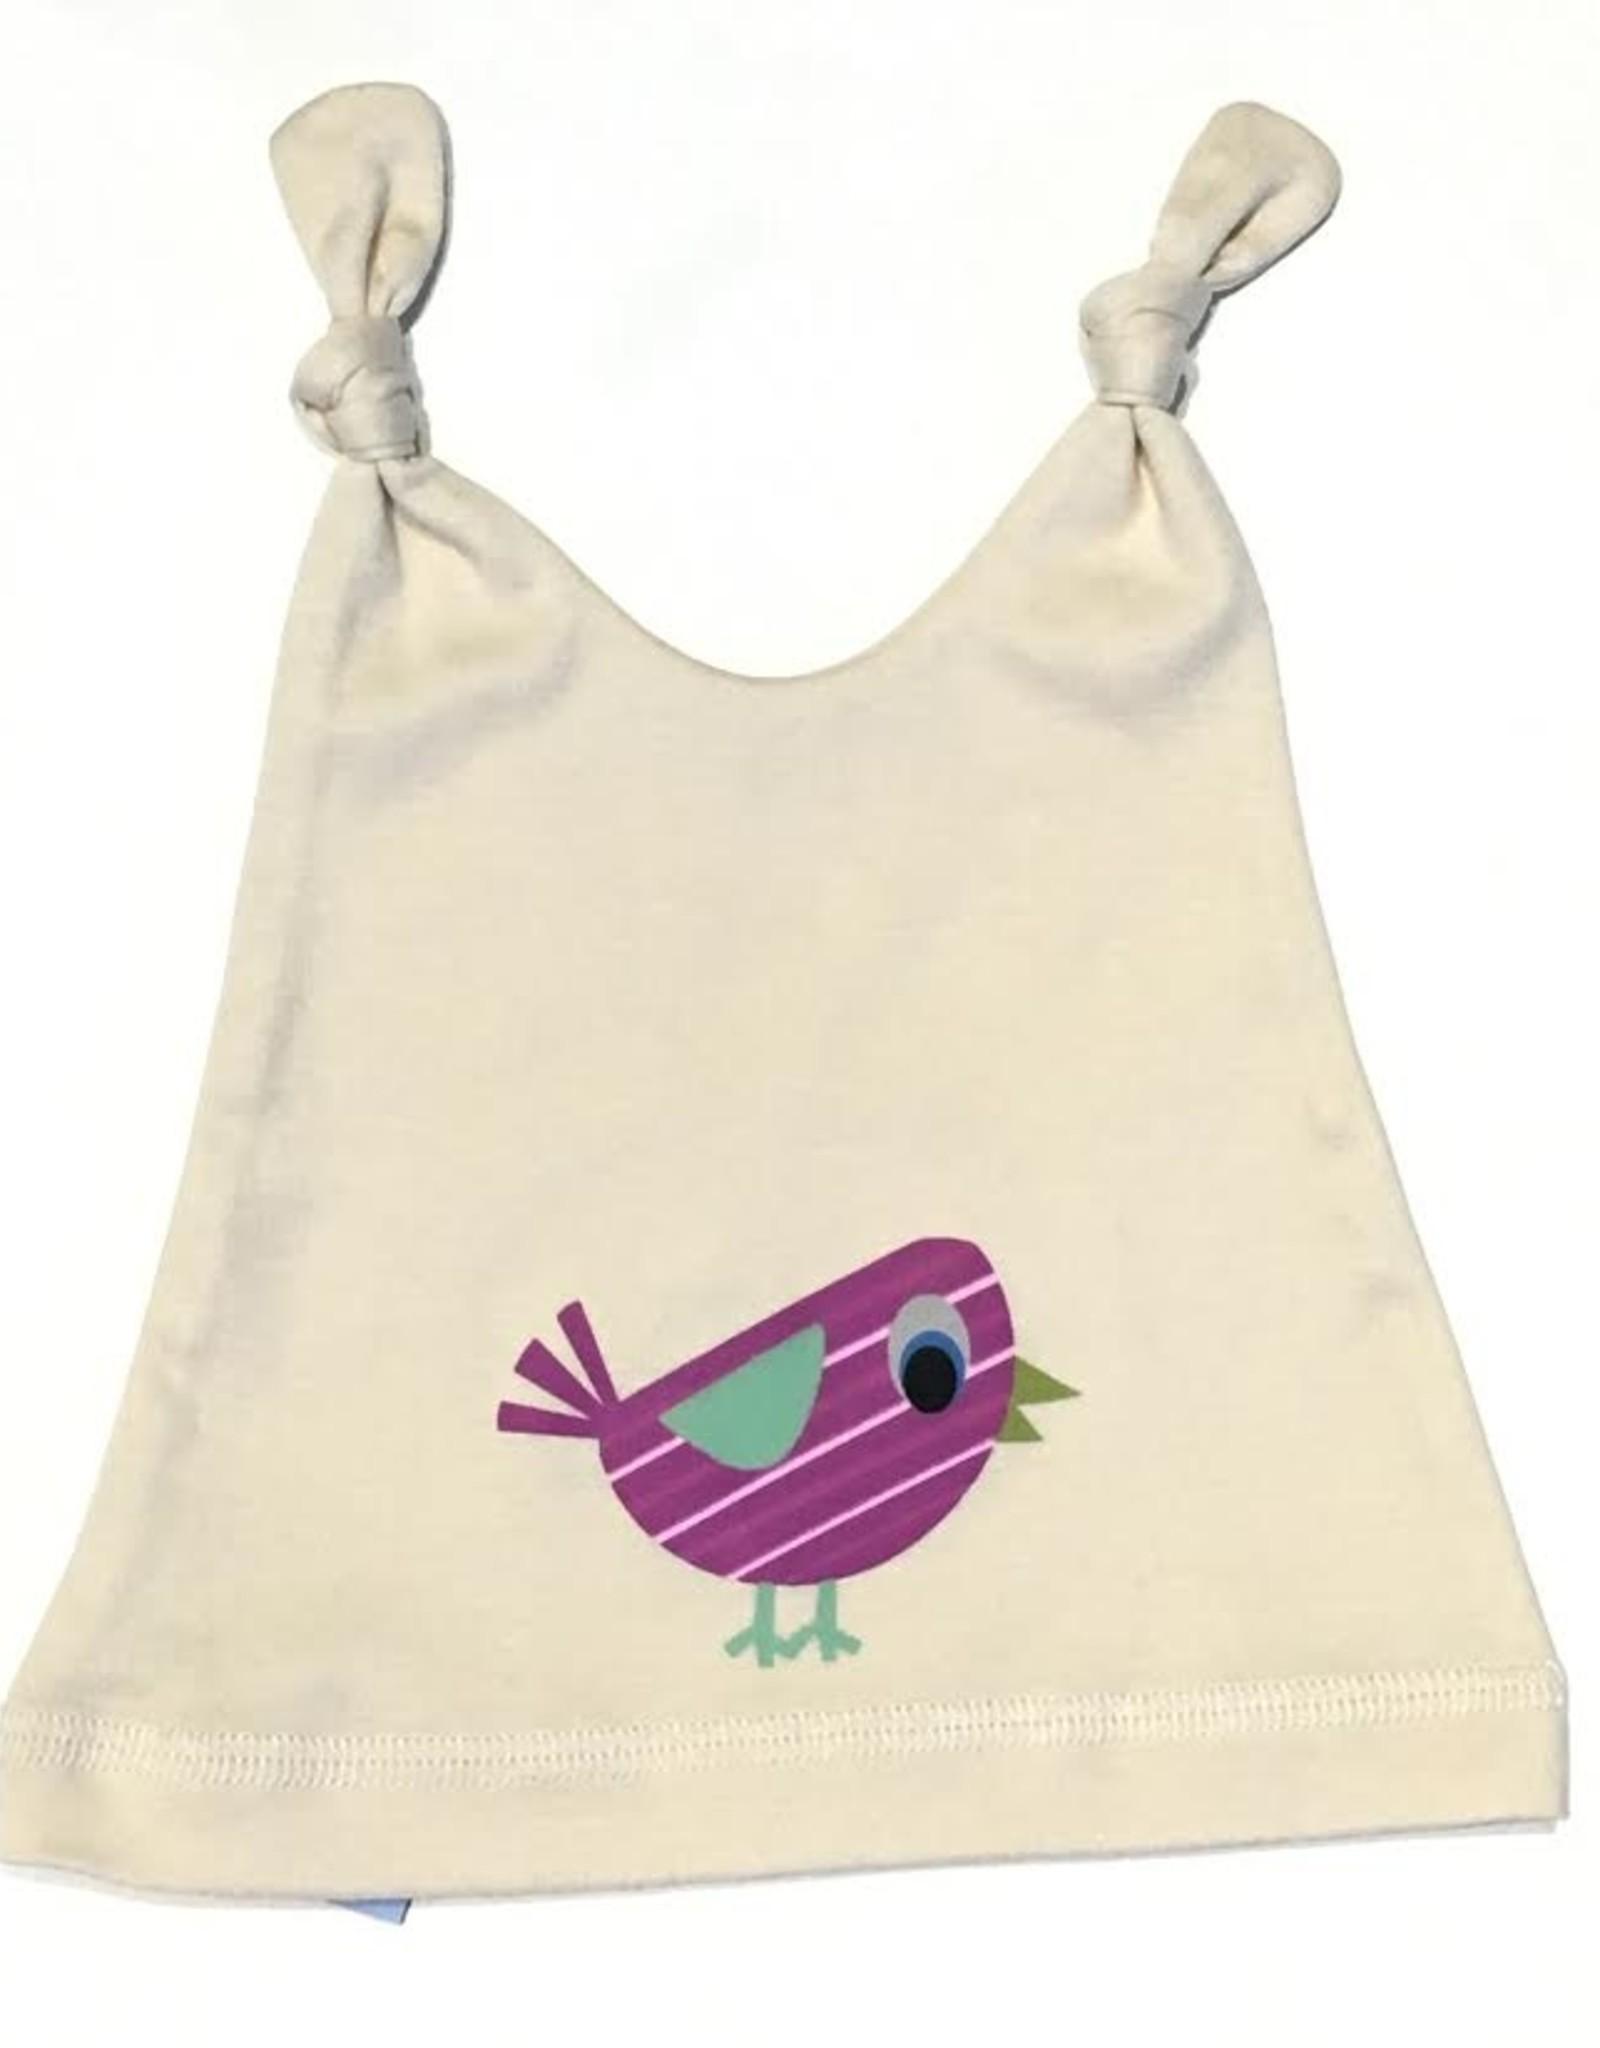 Lou & Dejlig Organic Cotton Cap